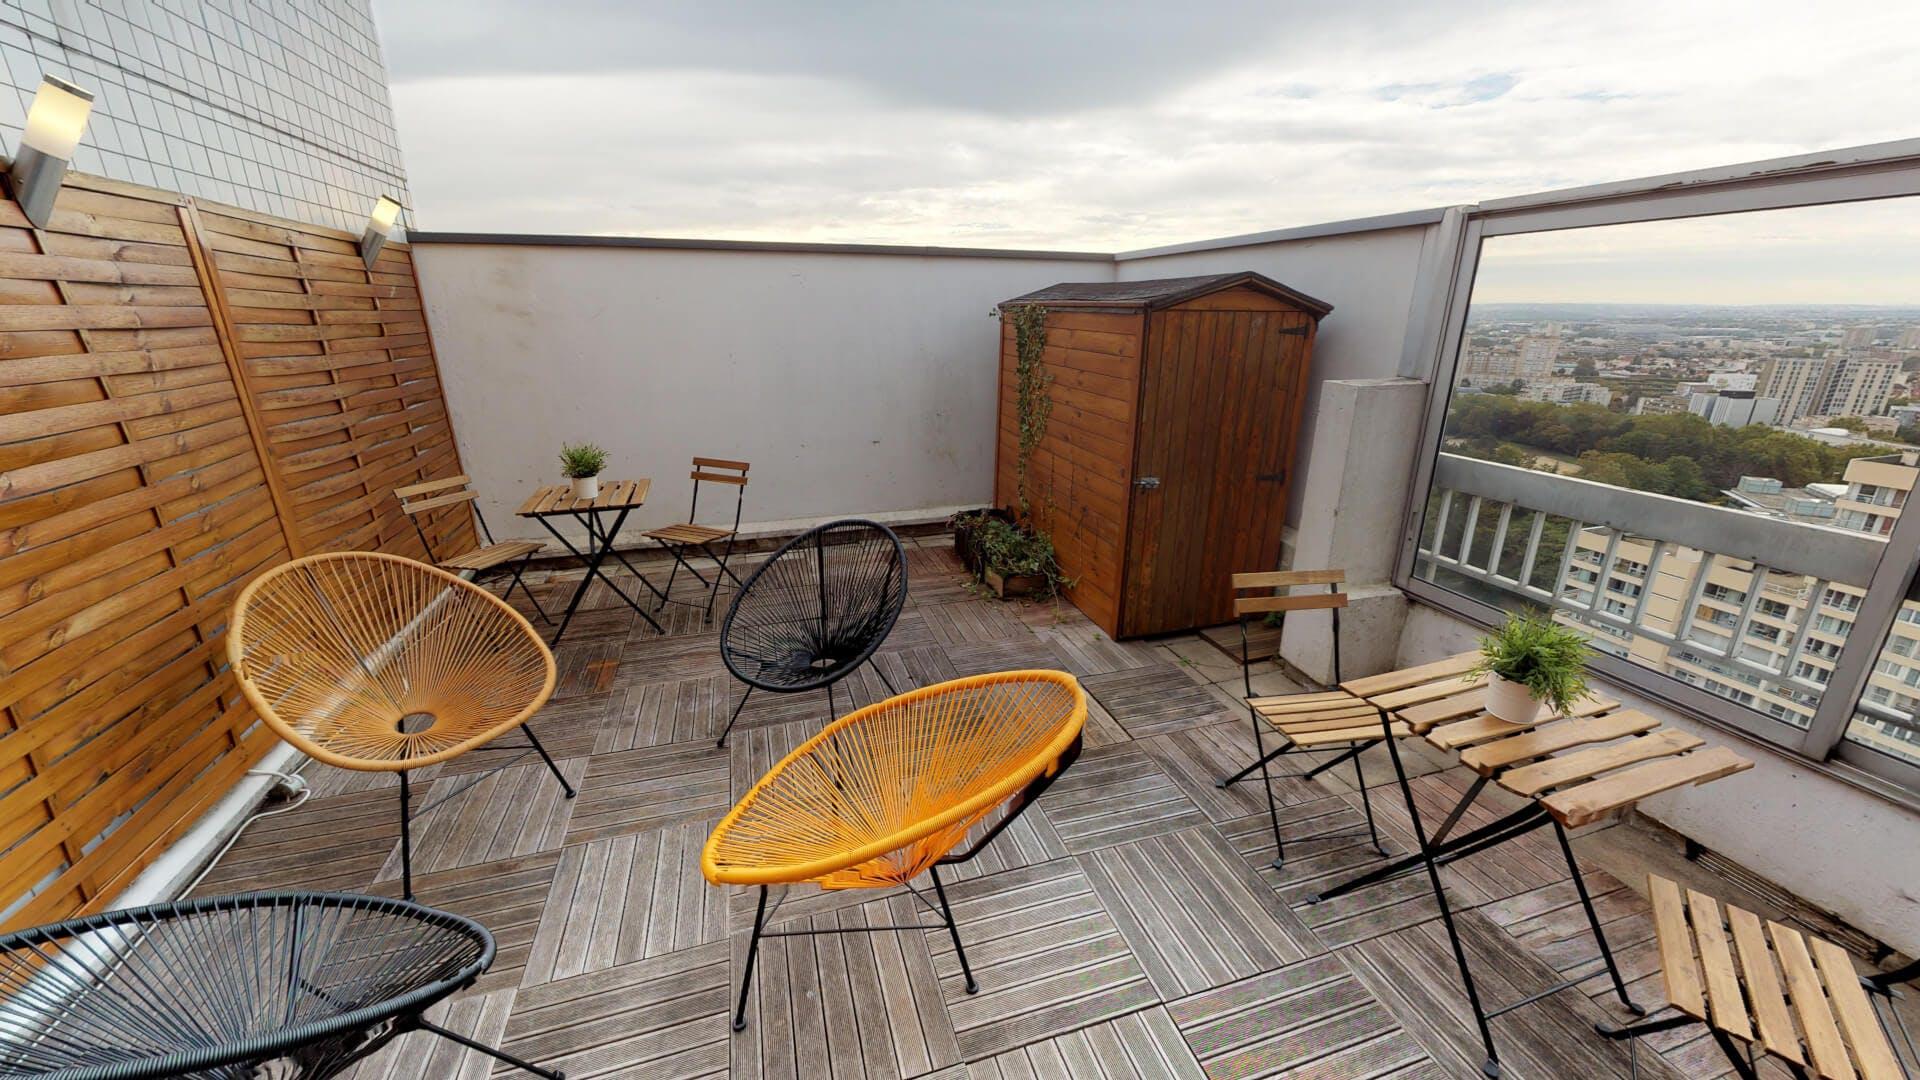 5 Residents   Nanterre   Stunning  Stylish Apt. w/ Rooftop Deck